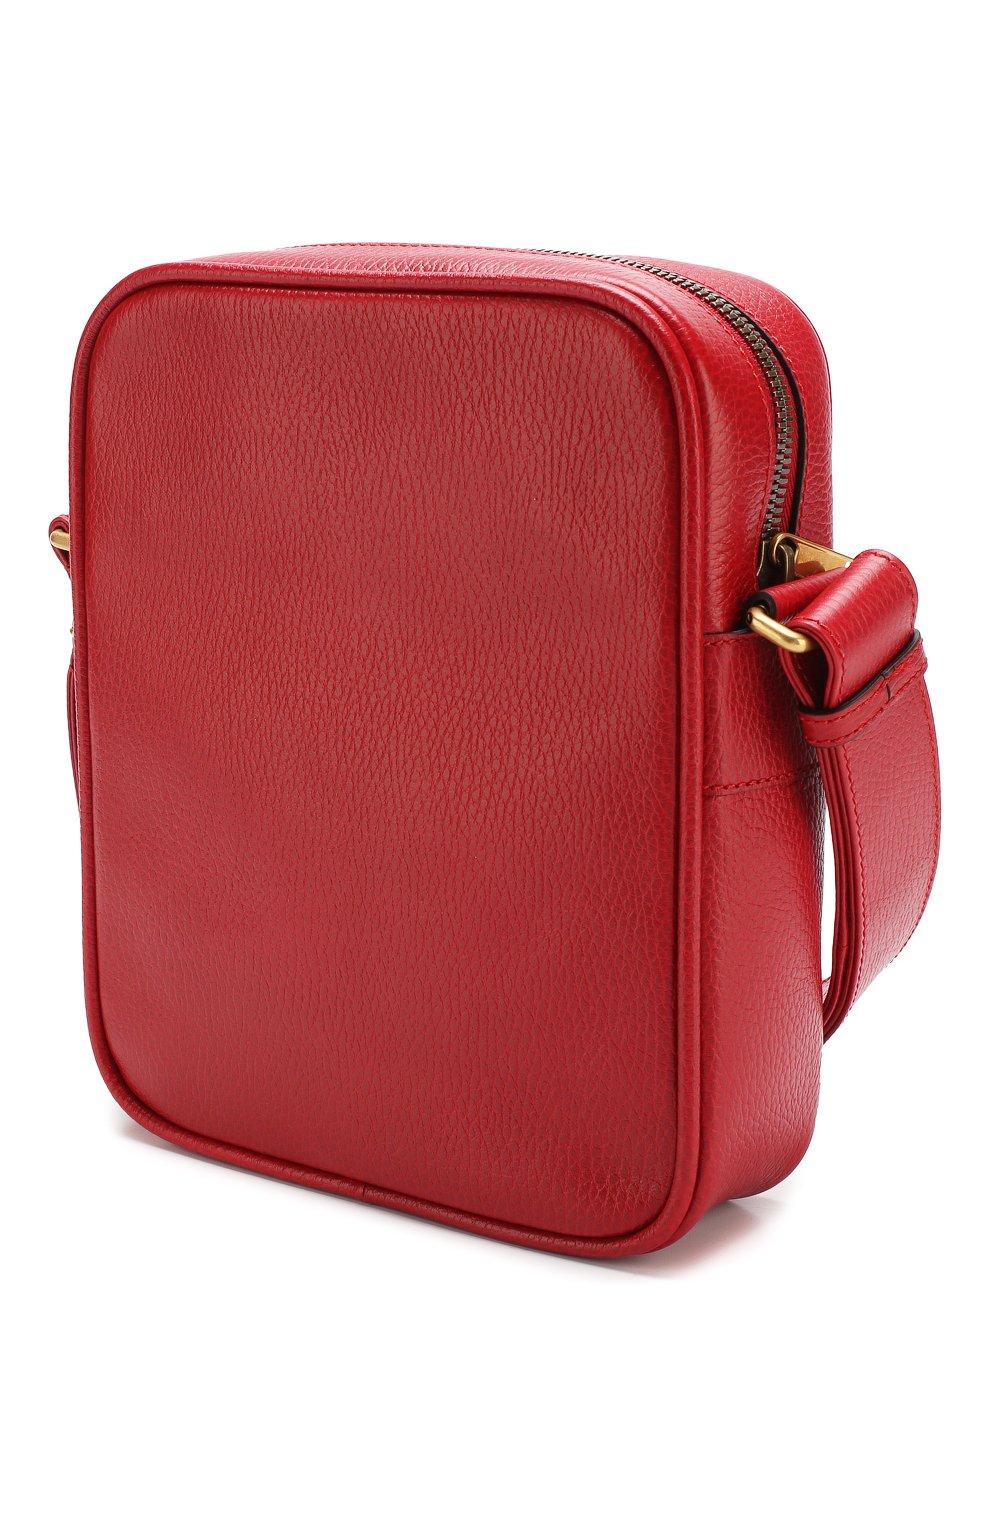 2eb5ca6d78fd Мужская красная кожаная сумка-планшет с логотипом бренда GUCCI ...